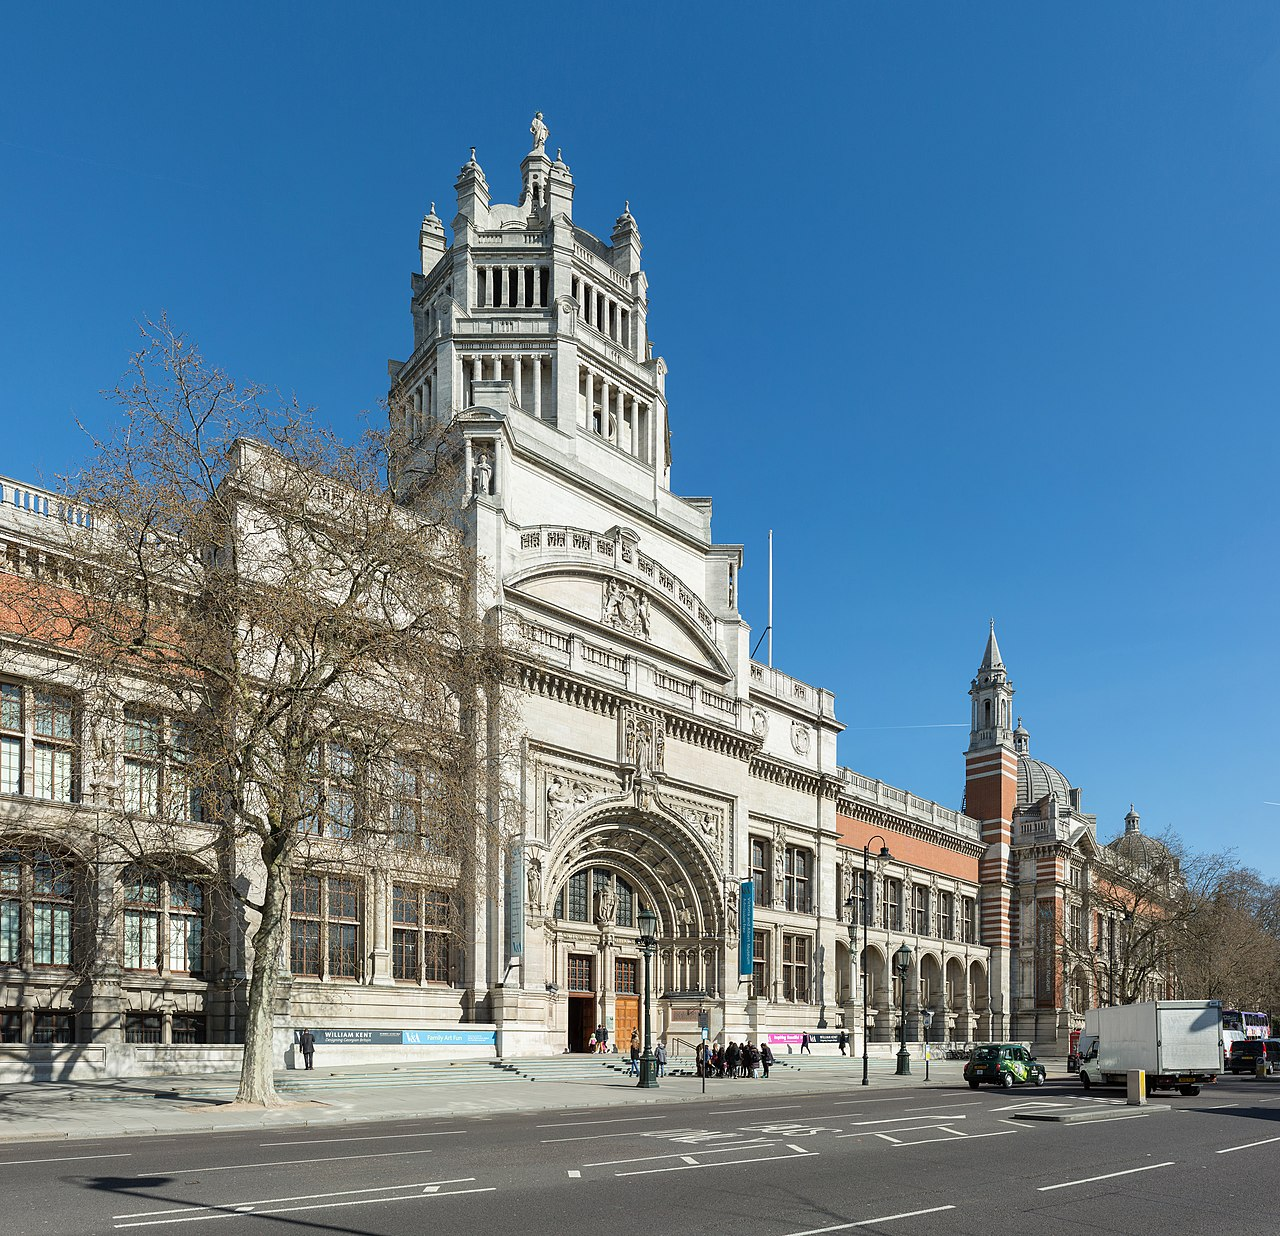 Victoria & Albert Museum Entrance, London, UK - Diliff.jpg